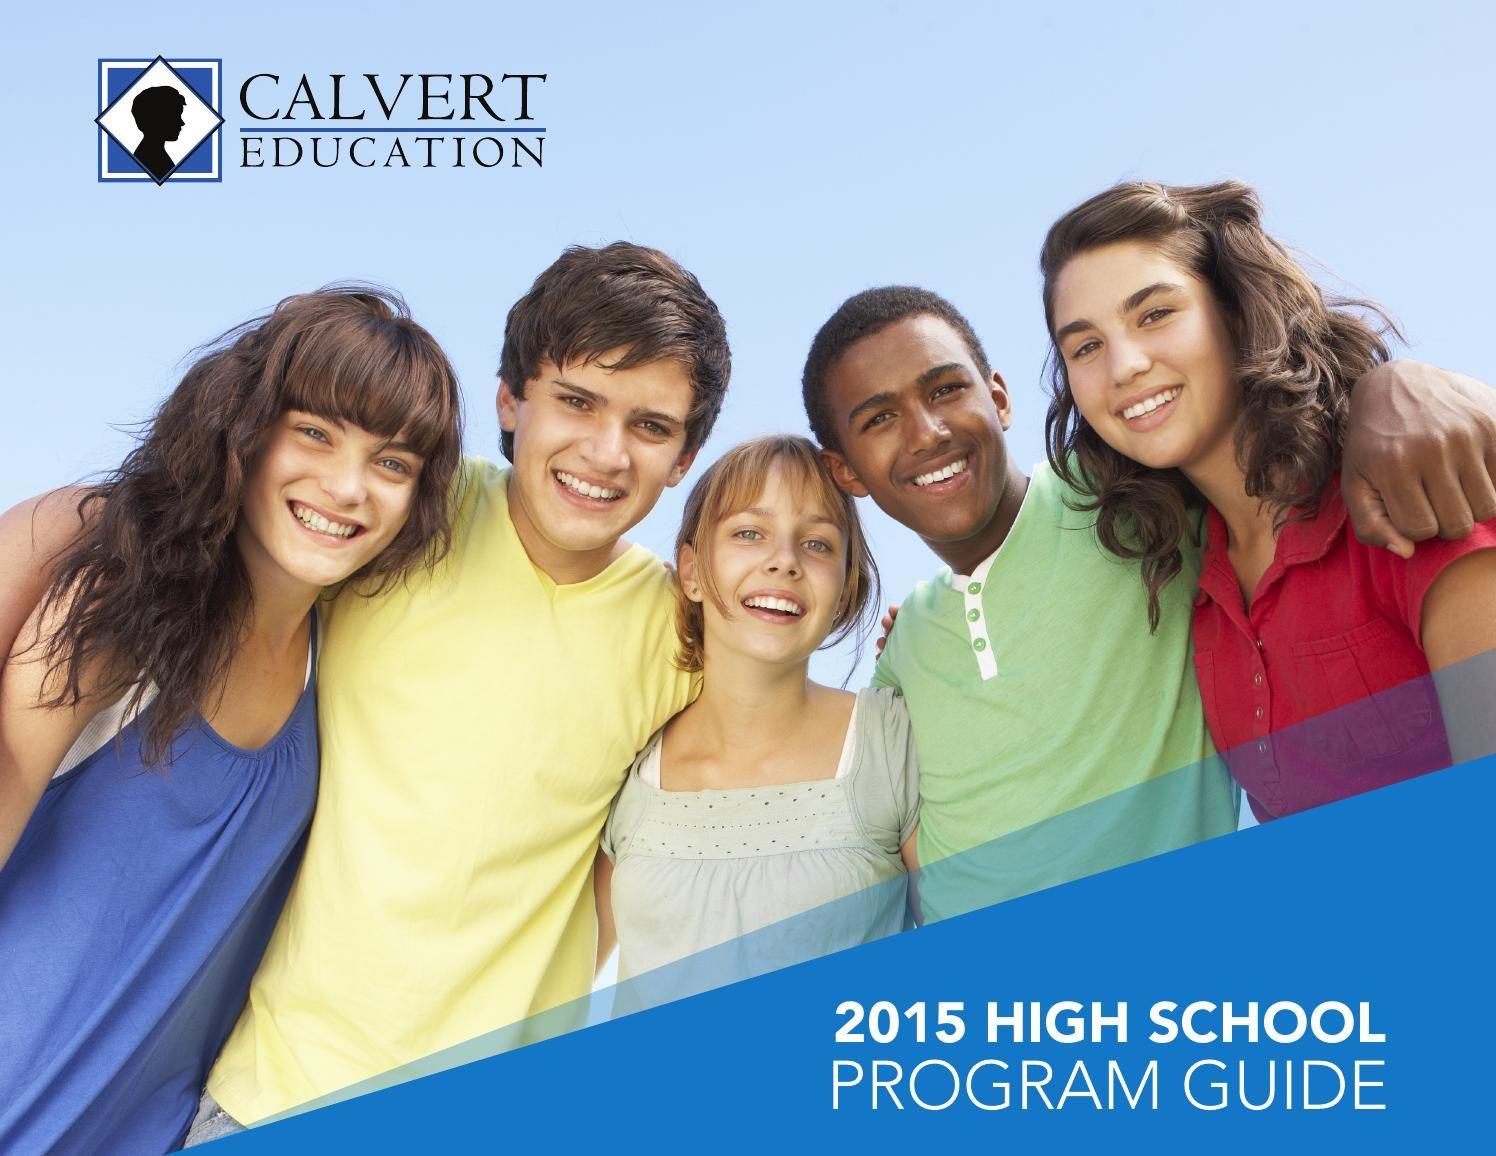 Calvert Education High School Program Guide Calvert Education High